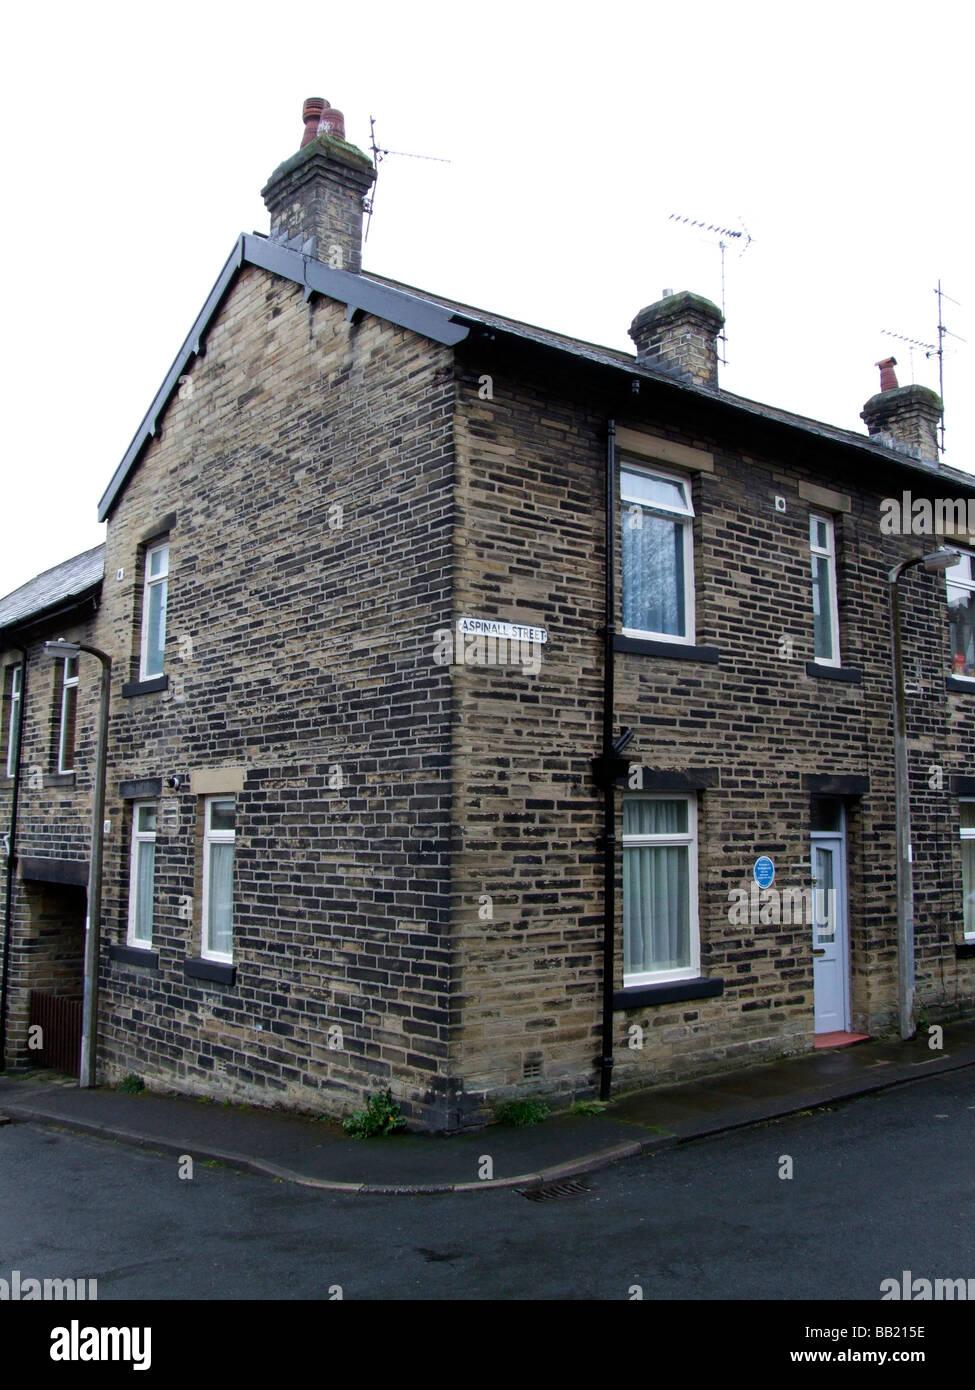 Birthplace home of poet Ted Hughes, Mytholmroyd, West Yorkshire - Stock Image